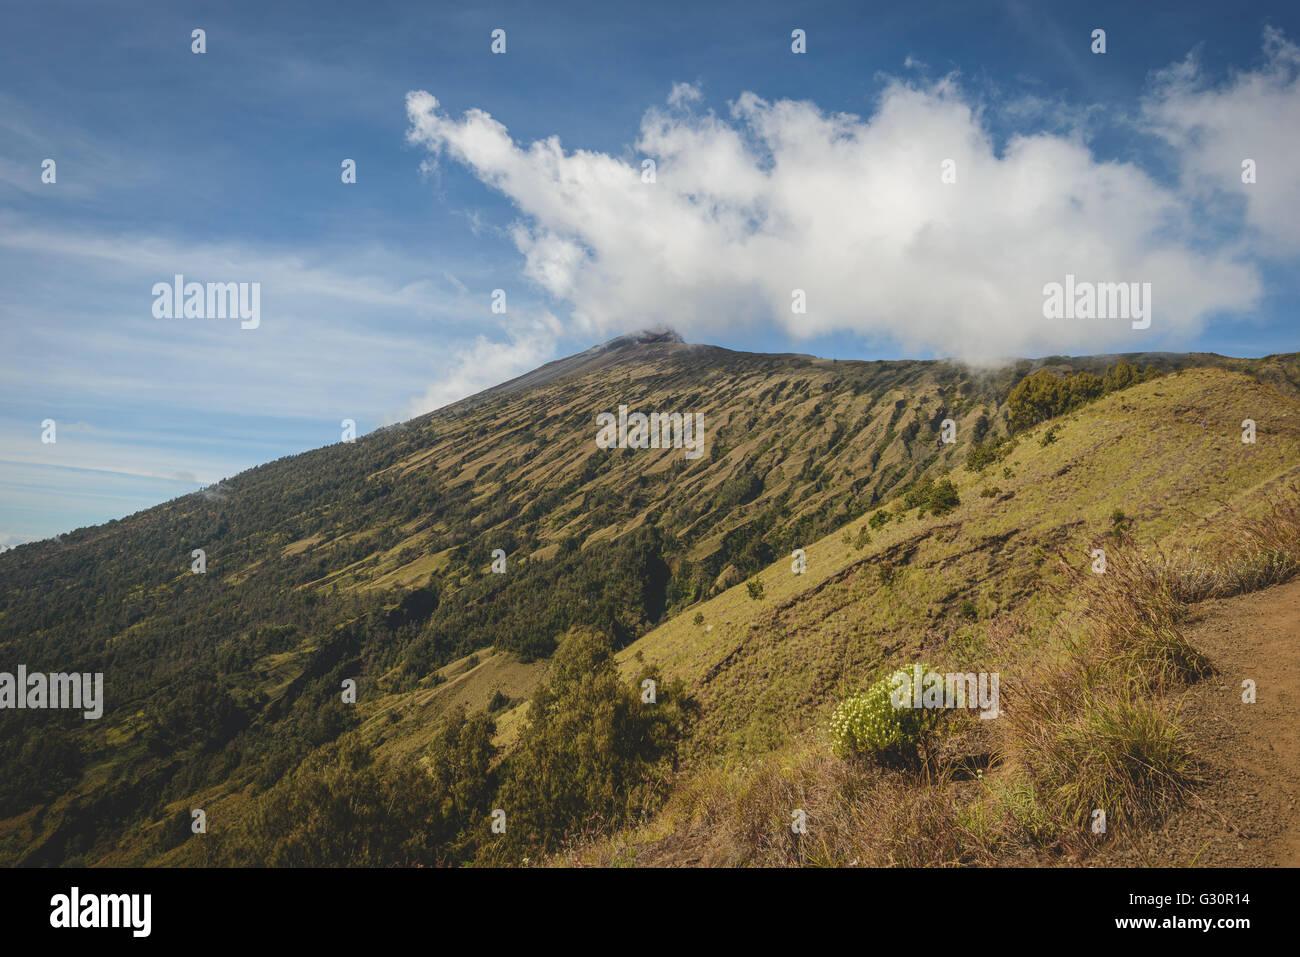 The Mt Rinjani summit from below - Stock Image